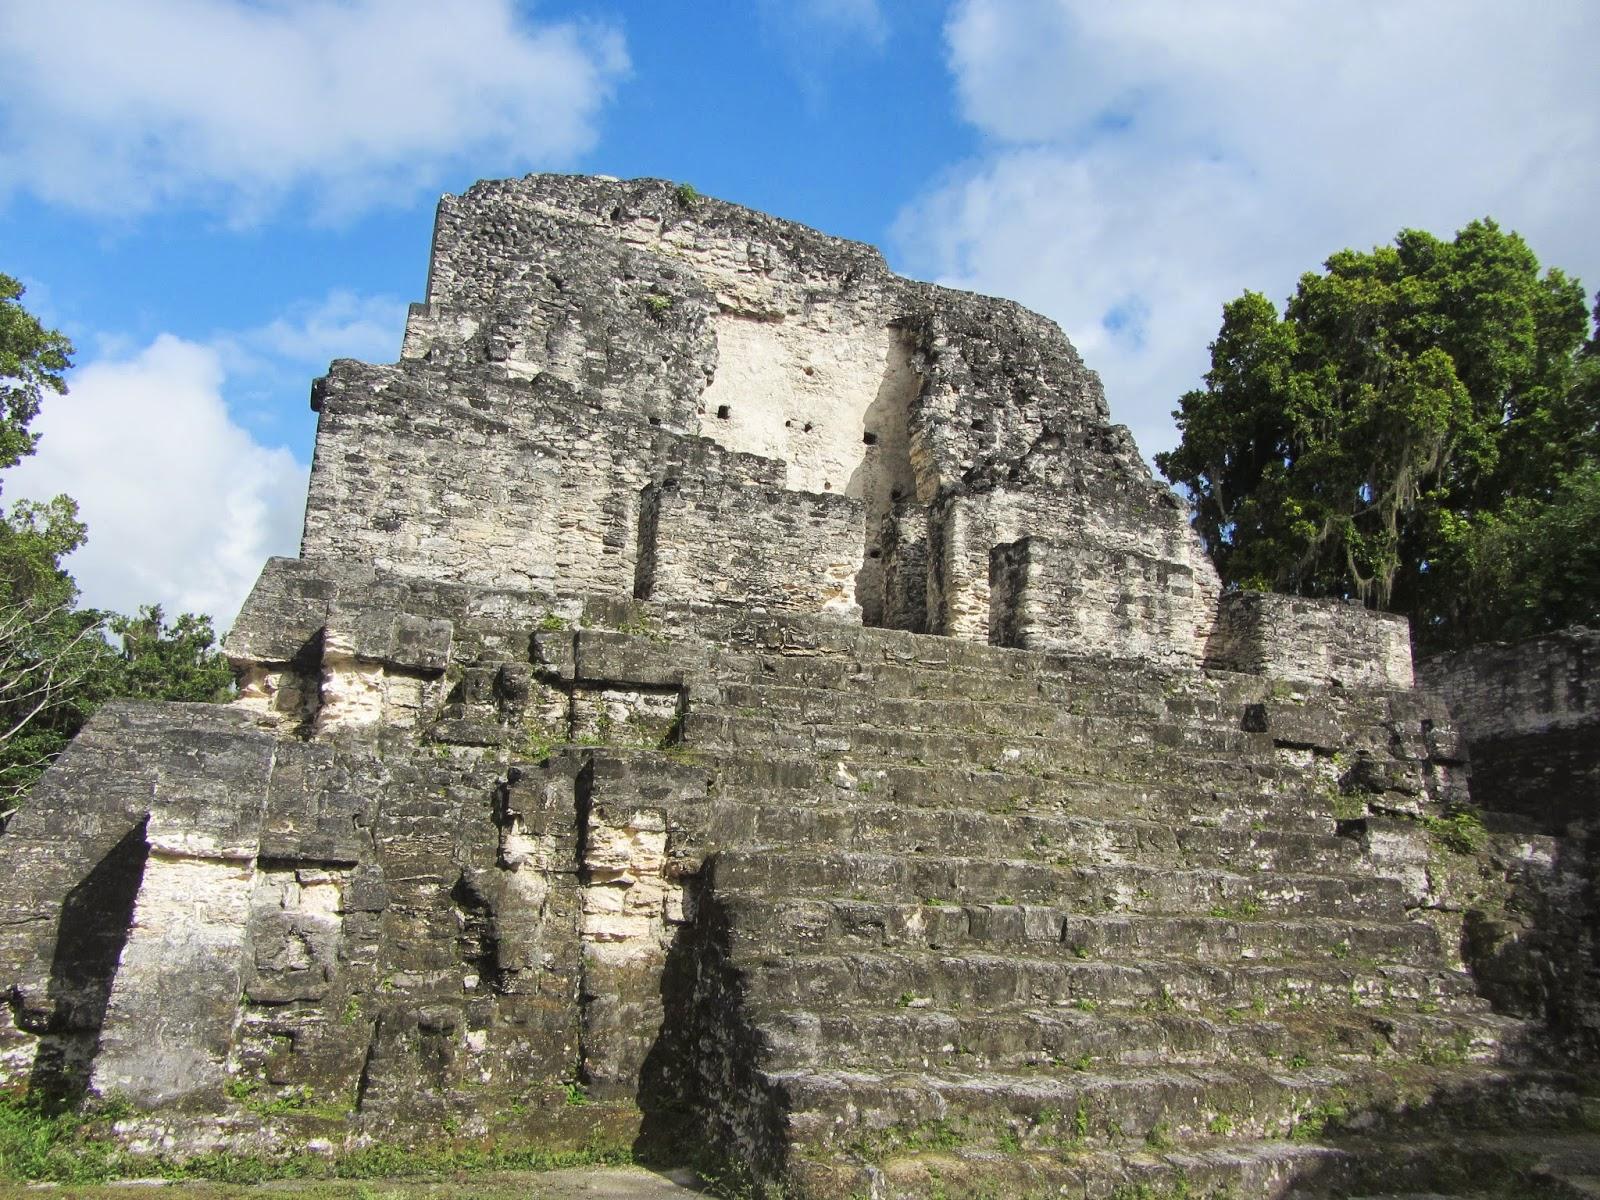 Seafloor Sediments Mayan Mysteries the Mystery What&nbspEssay